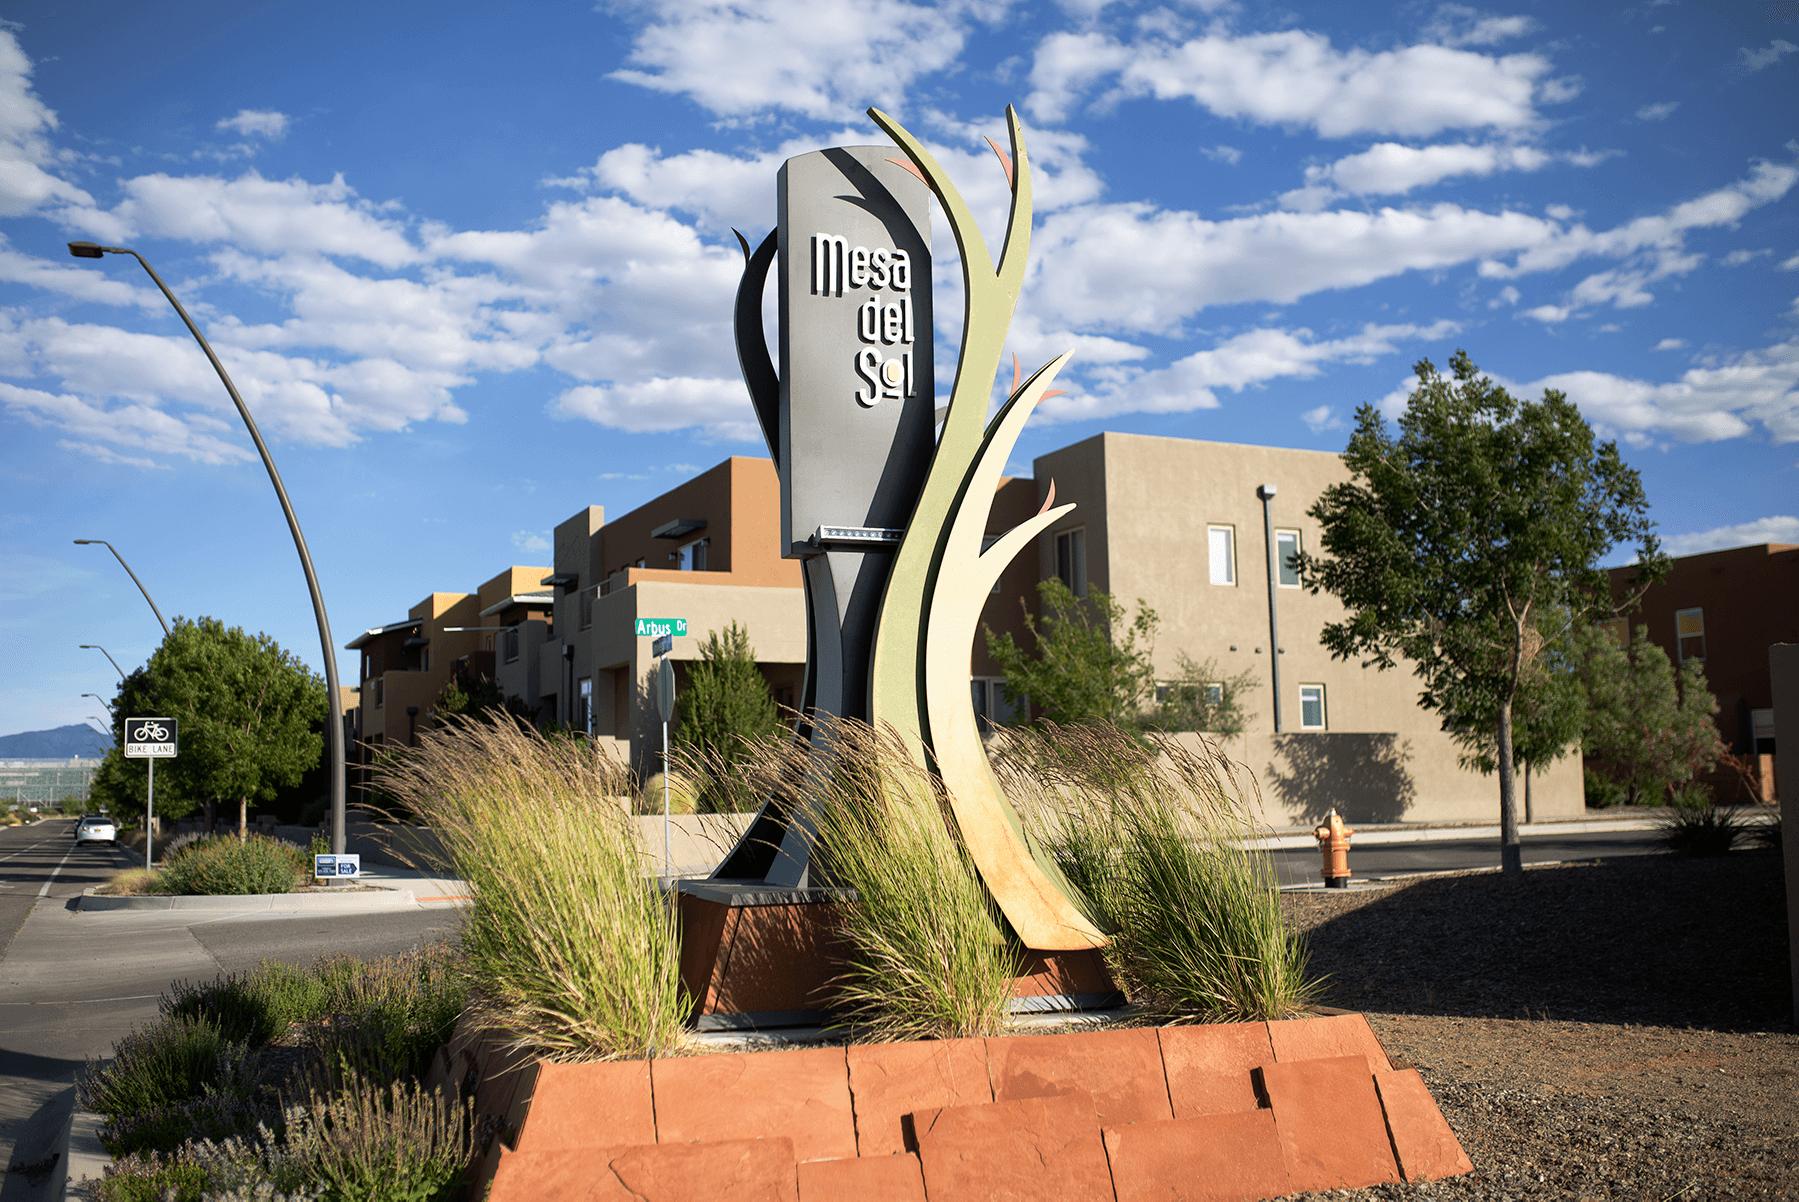 'Mesa Del Sol' by Abrazo Homes in Albuquerque